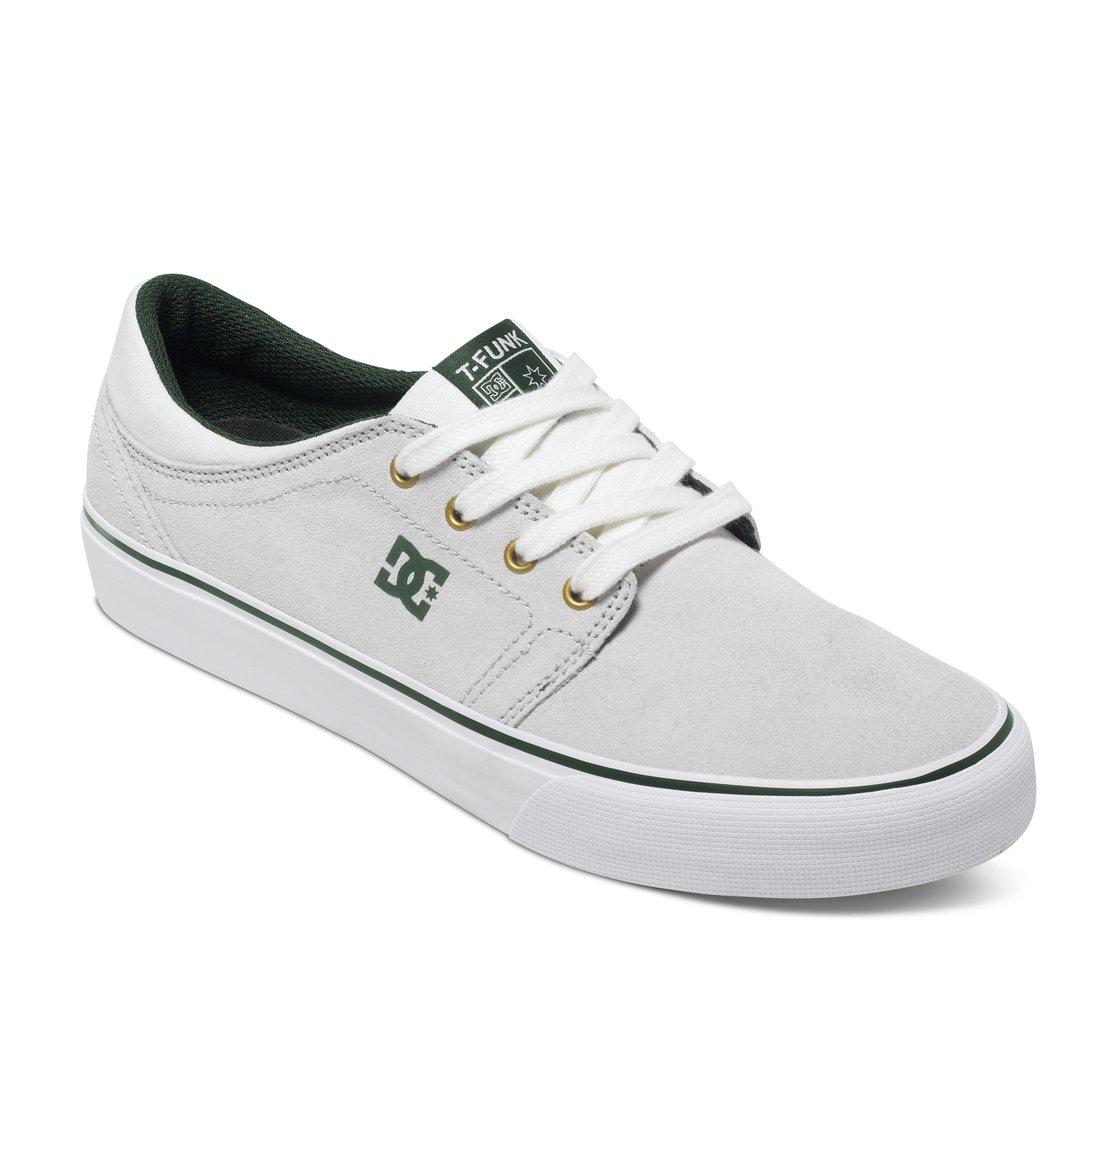 Dc Shoes Trase S Zapatillas